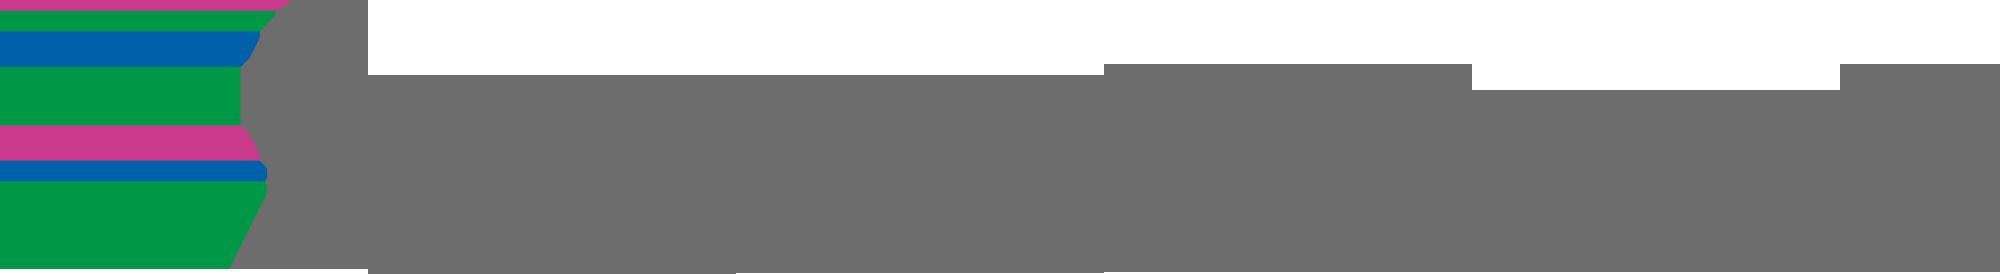 https://prestoninternational.com/wp-content/uploads/2018/06/f1df9b77-d666-4ada-bf59-c87952bb8848tenaris-silcotub-logo.png